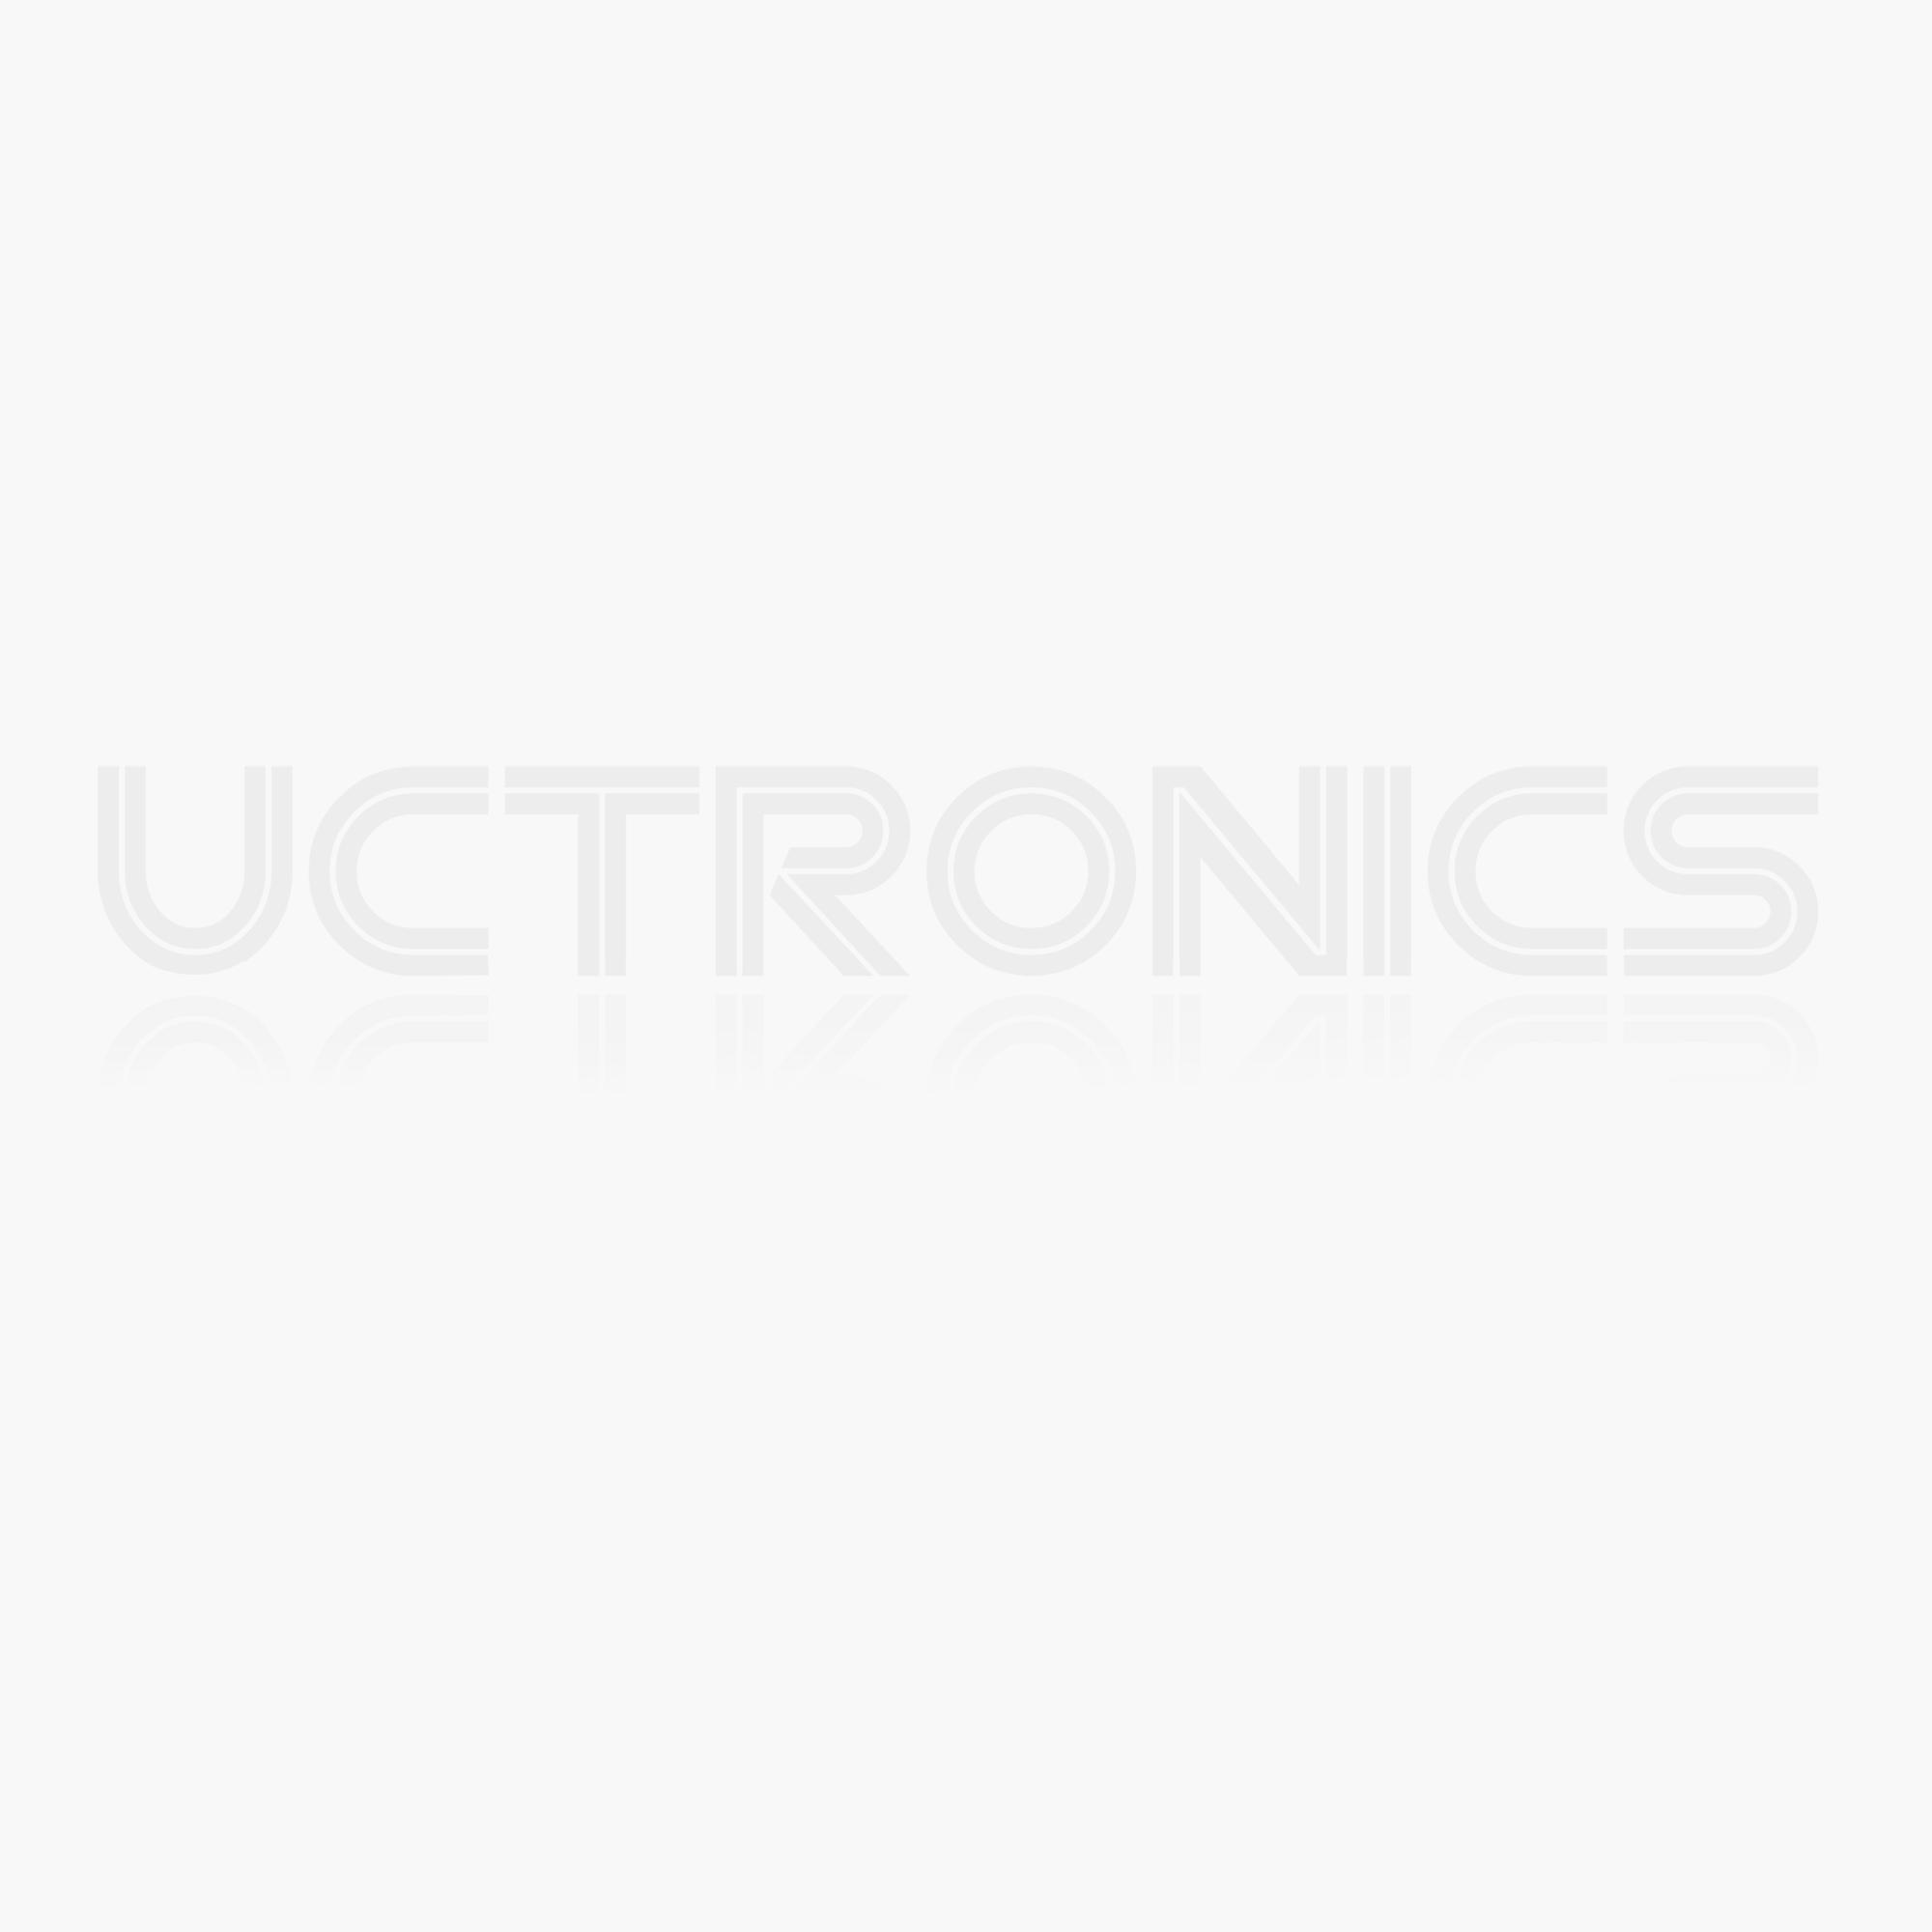 Arducam Global Shutter Camera Module for Raspberry Pi, 0.31MP Monochrome OV7251, 3 μm Pixel Size, Plugged into Native MIPI CSI-2 Port